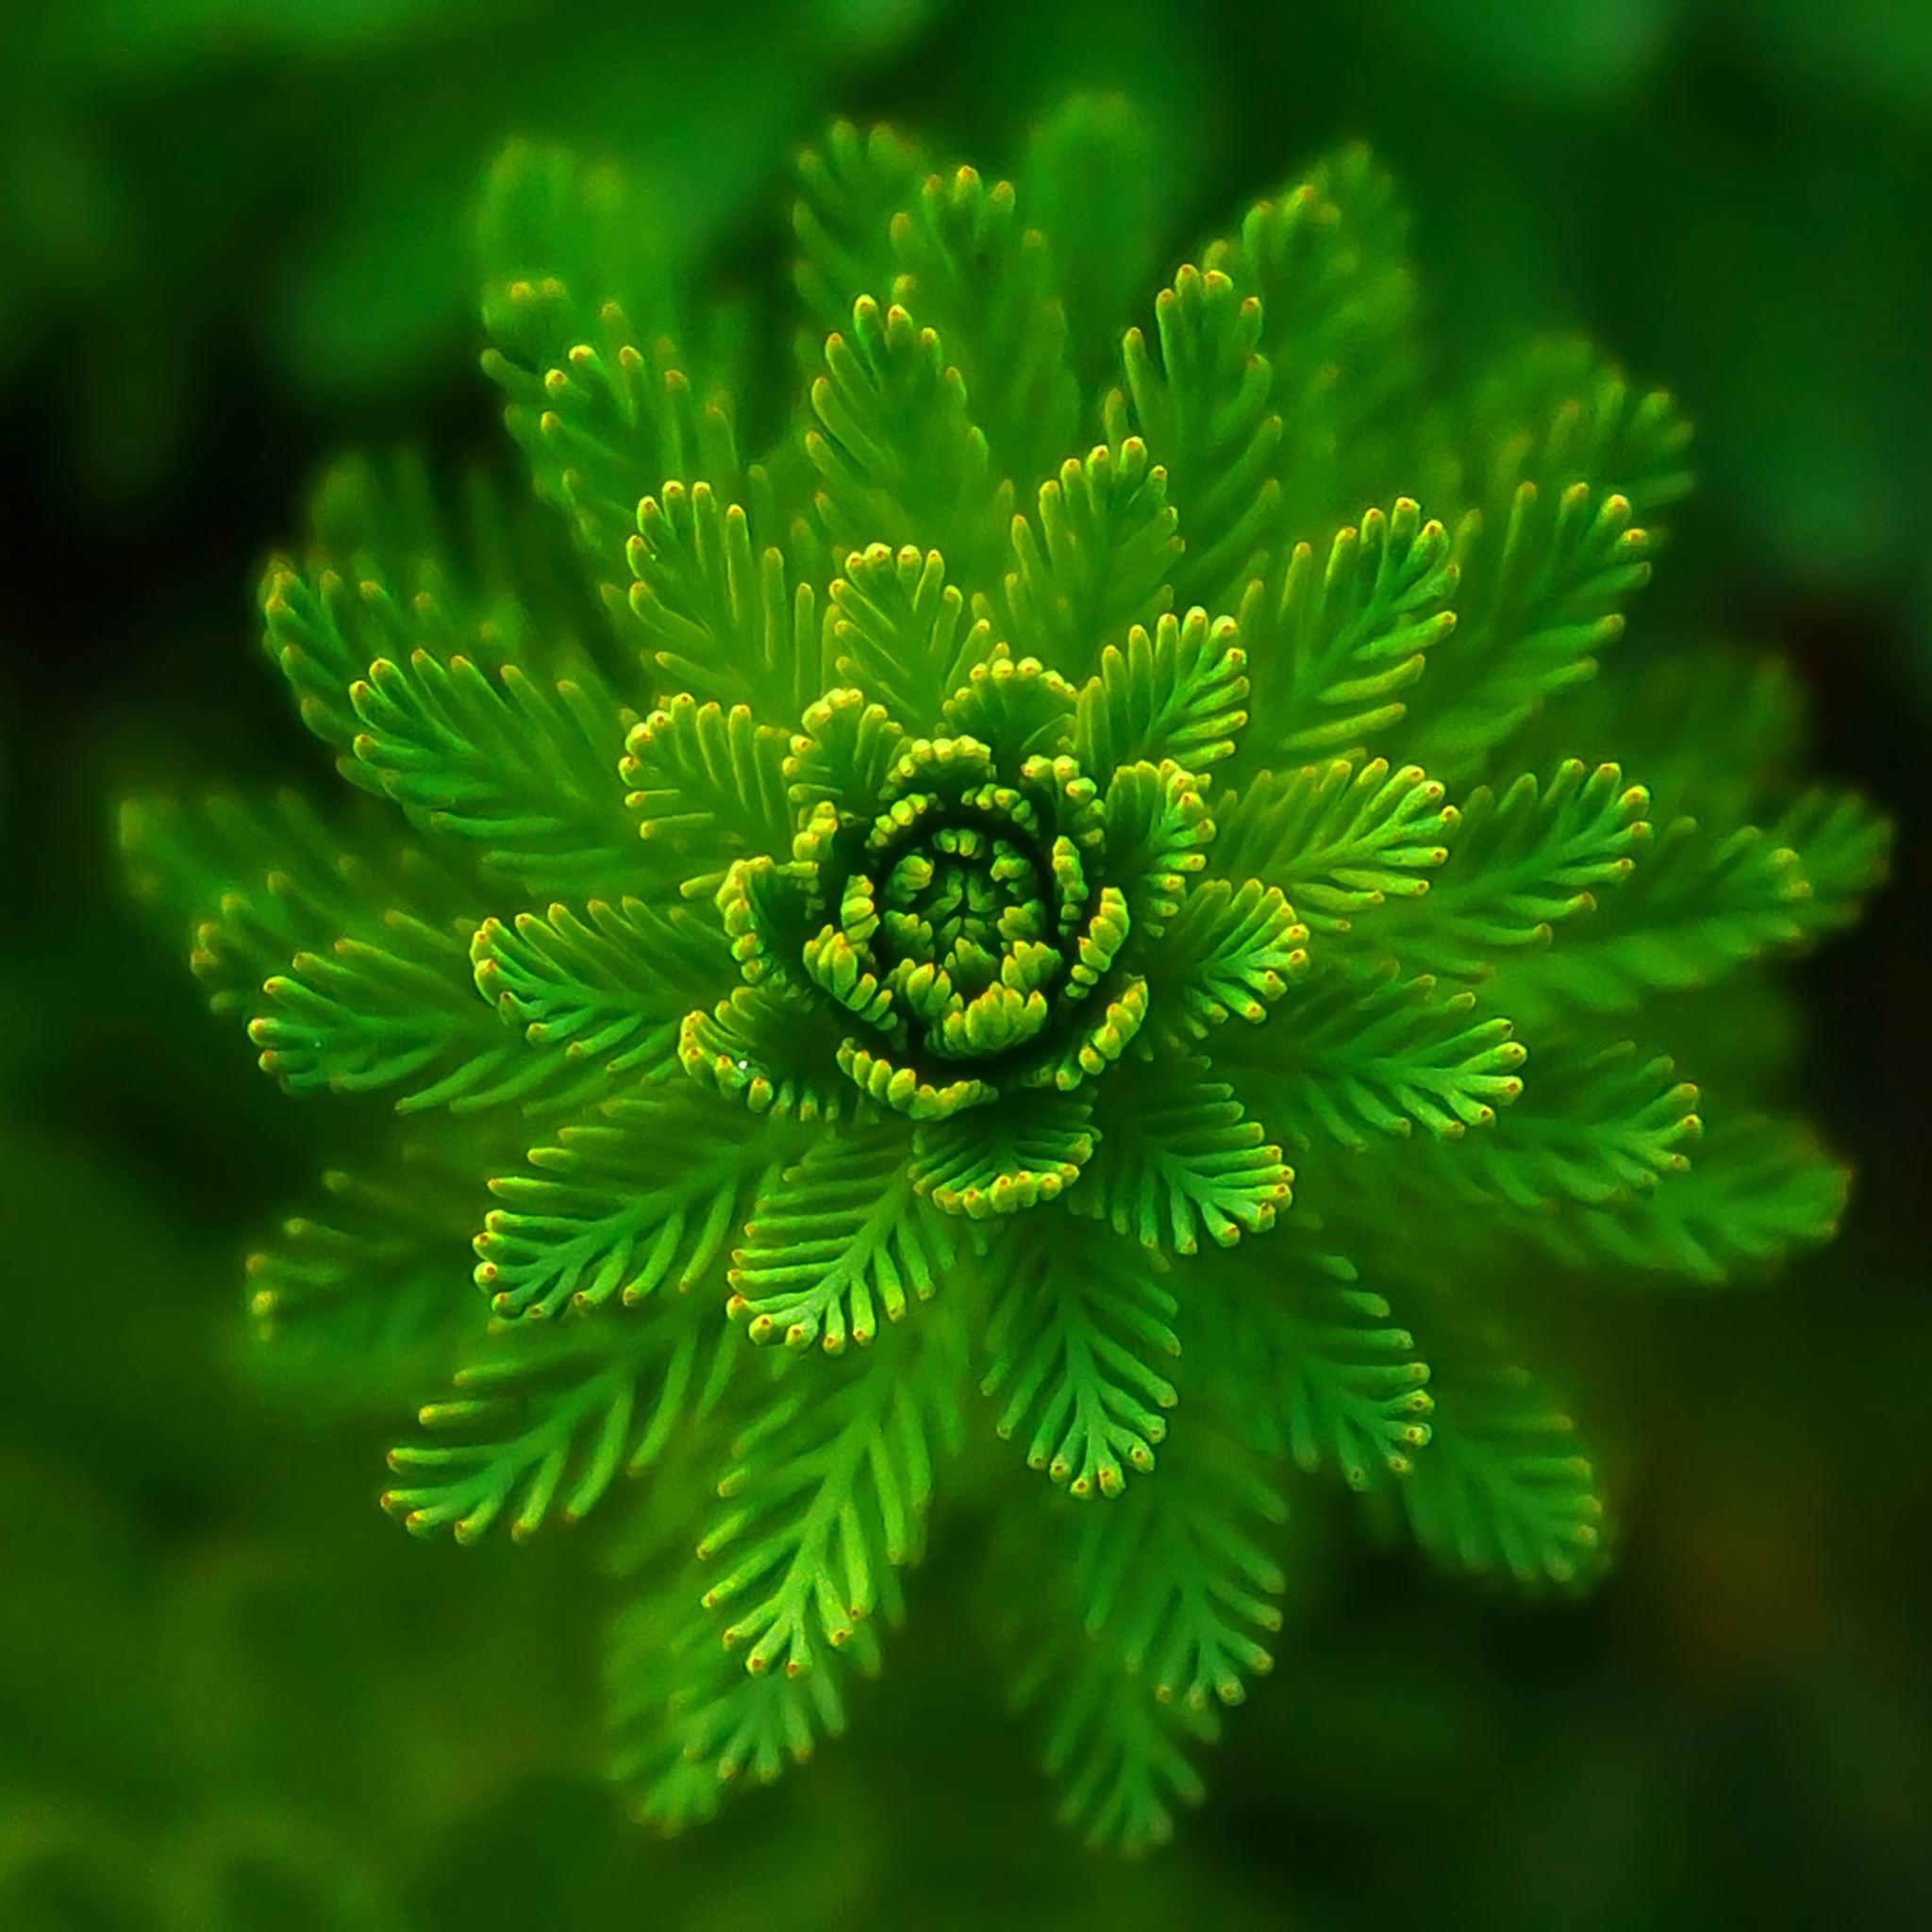 Algae plant iPad Air wallpaper